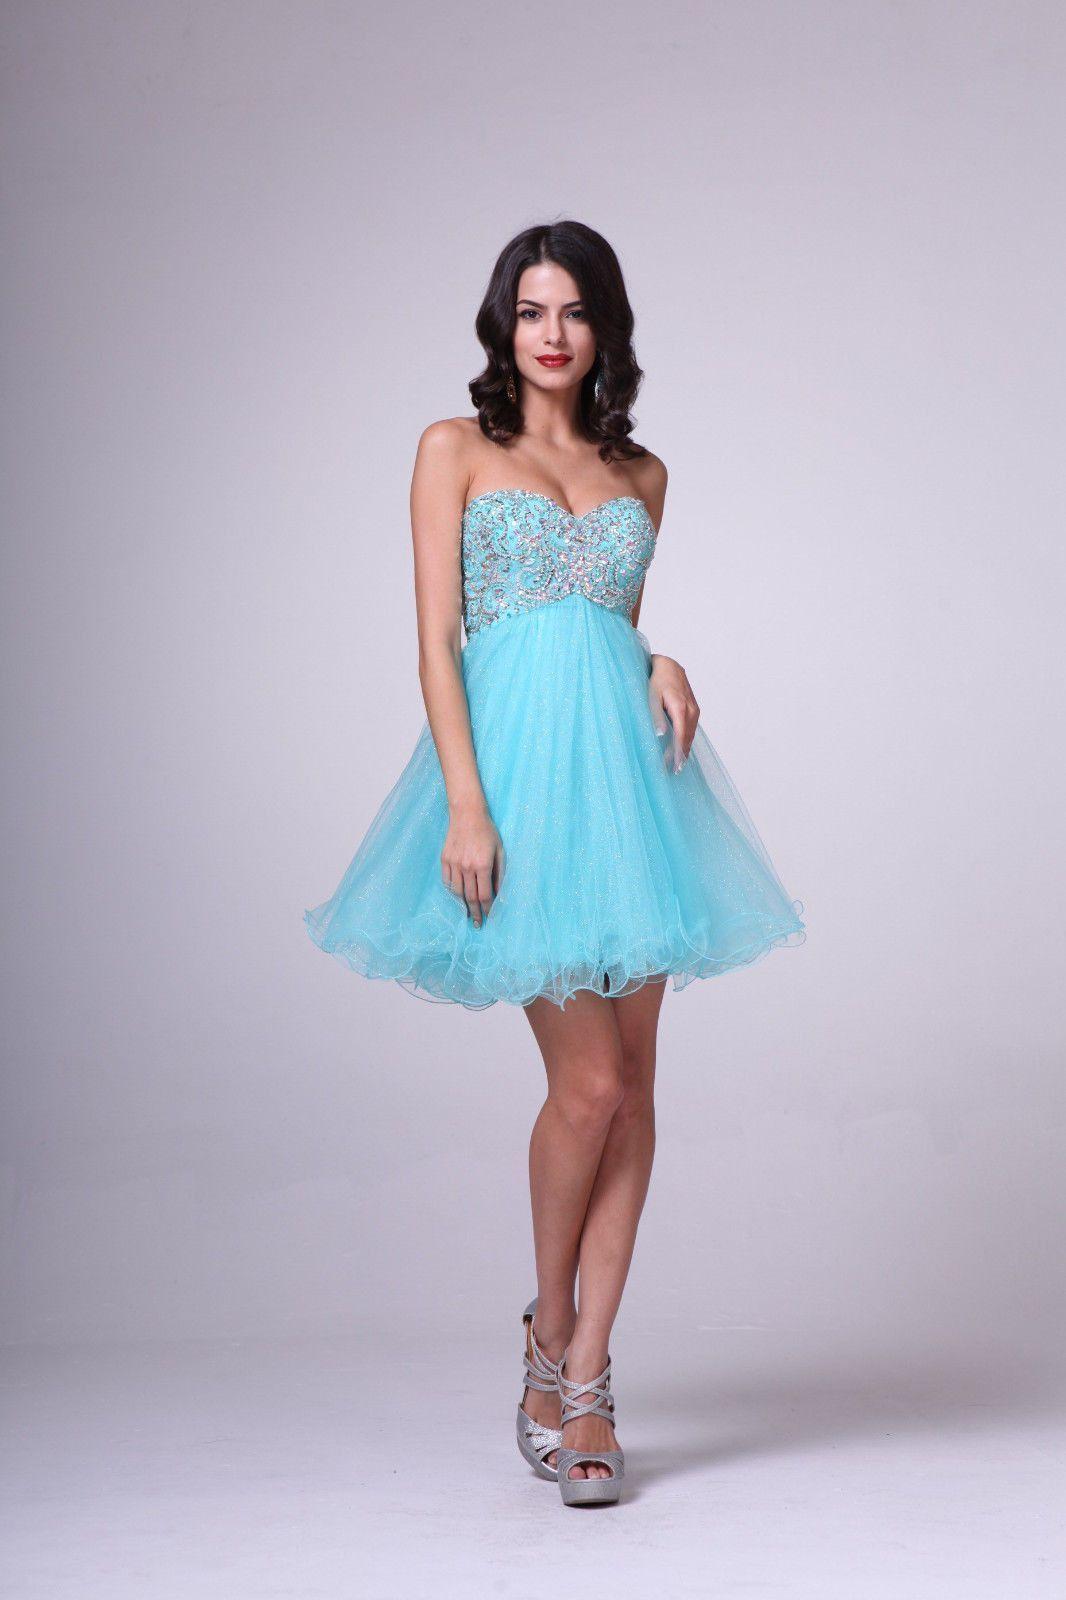 Short Mini Prom Evening Party Dress Homecoming Dress | dresses ...